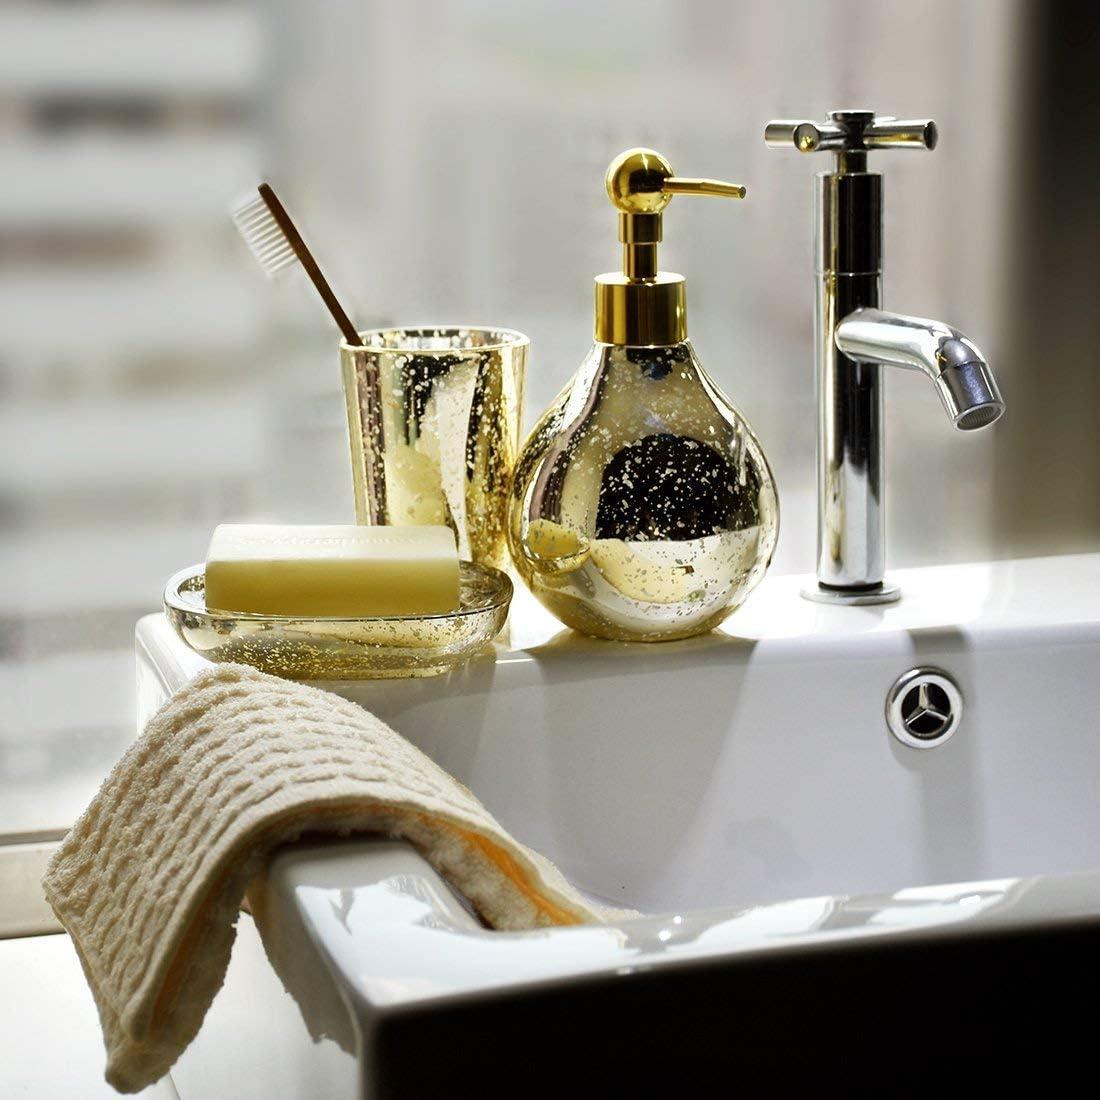 SATU BROWN Bathroom Soap Dispenser Set Shimmering Golden Mosaic Bathroom Tumbler Bathroom Soap Dish for Decor and Housewarming Gift